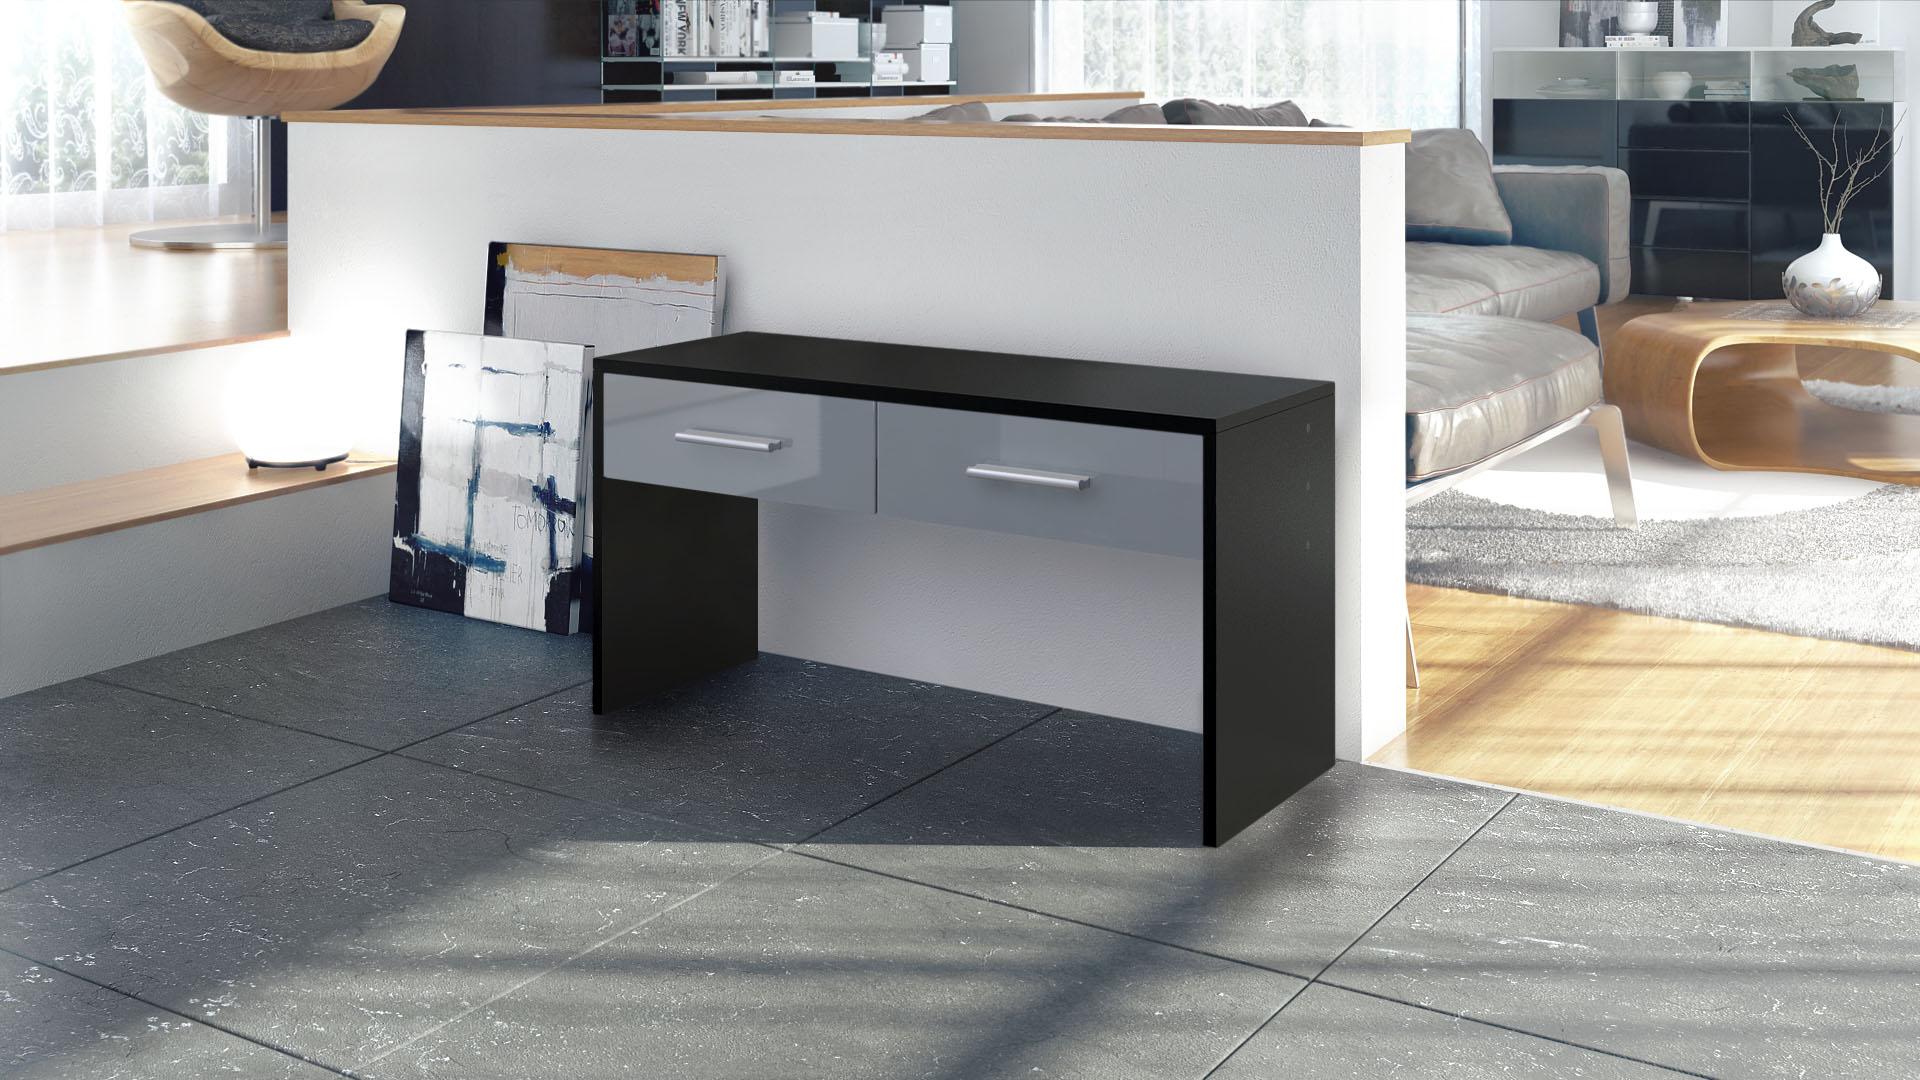 sitzbank schuhbank schemel garderobe hocker bank flurbank. Black Bedroom Furniture Sets. Home Design Ideas